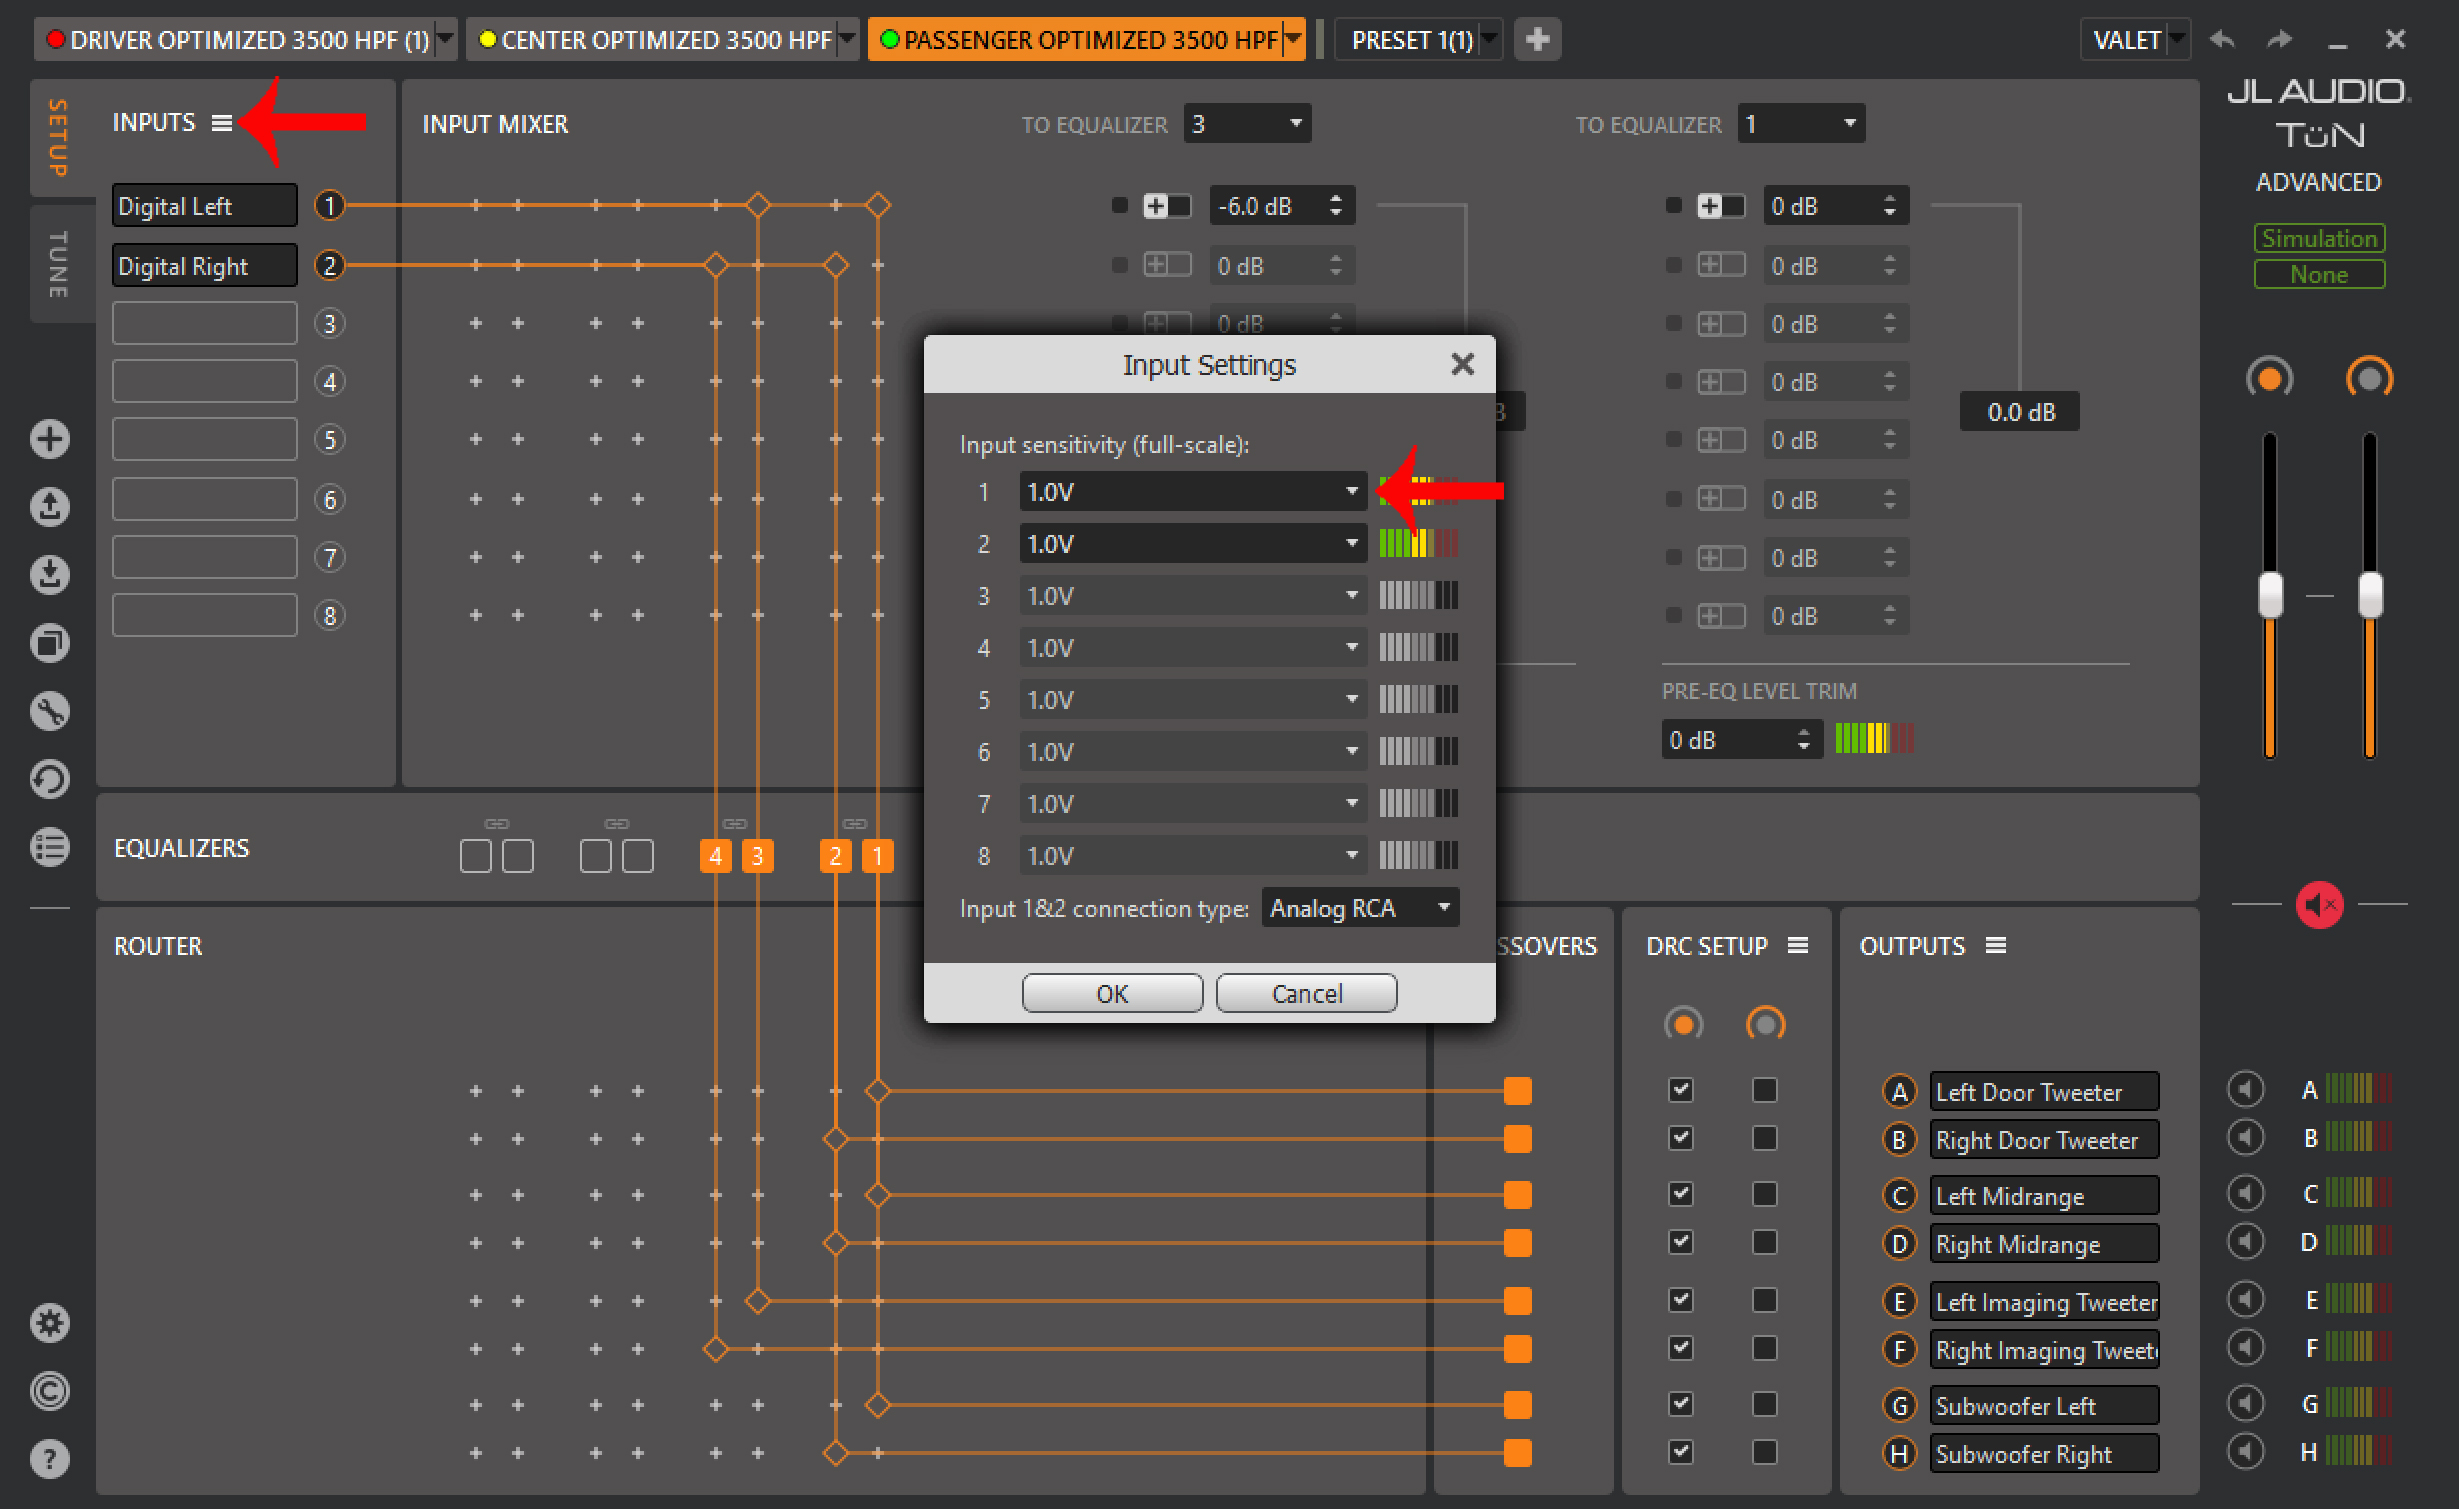 What Is Input Sensitivity Jl Audio Help Center Search Articles Distortion Meter Tun Twk